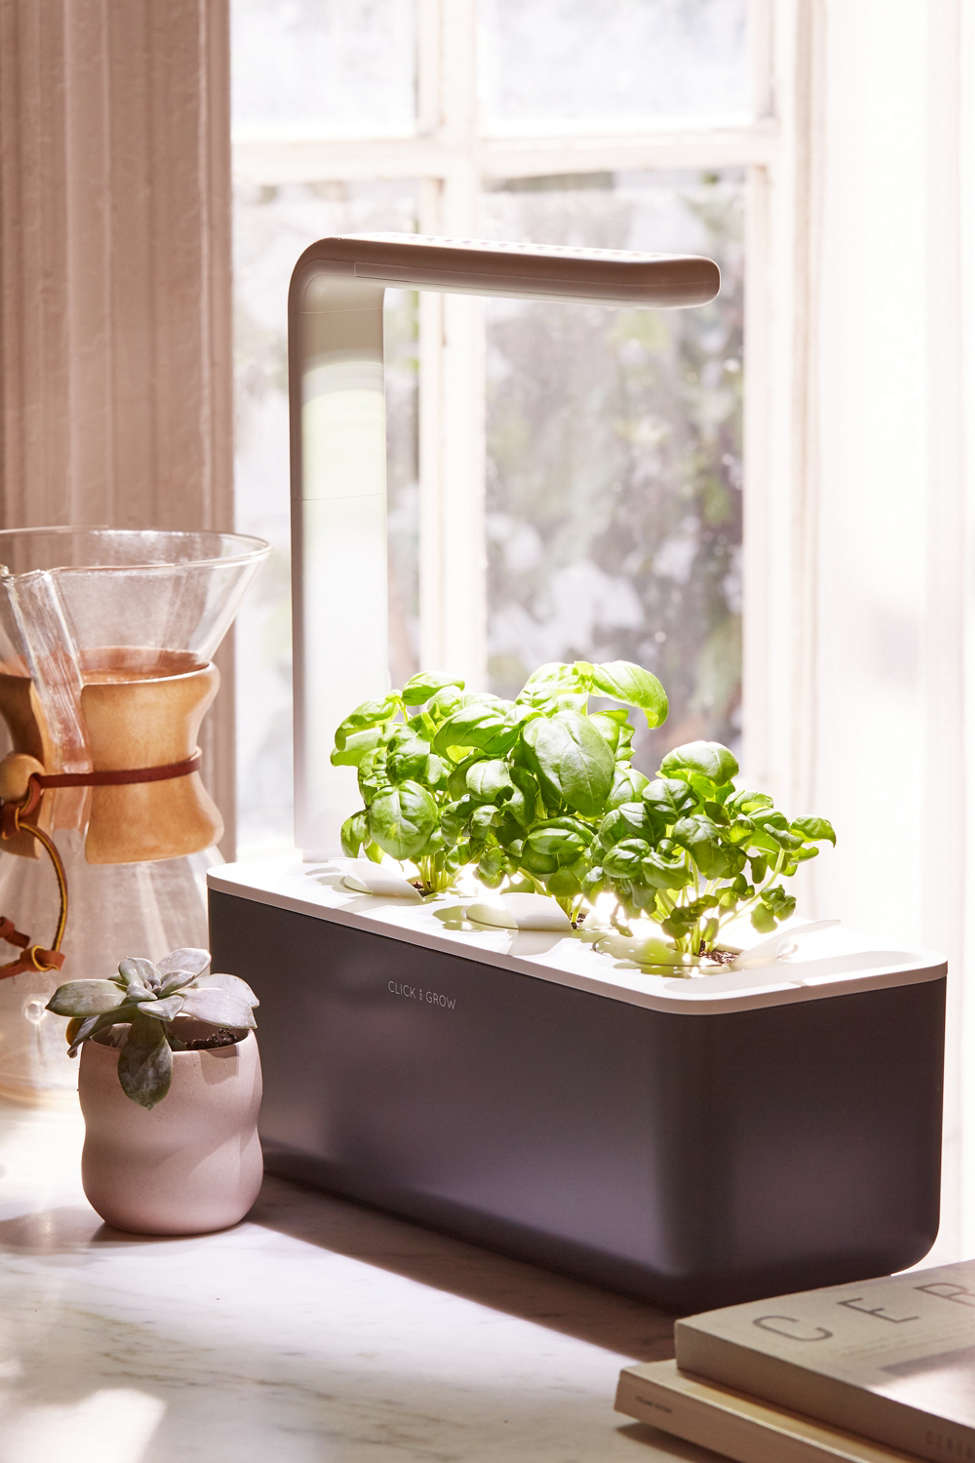 Slide View: 1: Click & Grow Smart Herb Garden II Starter Kit